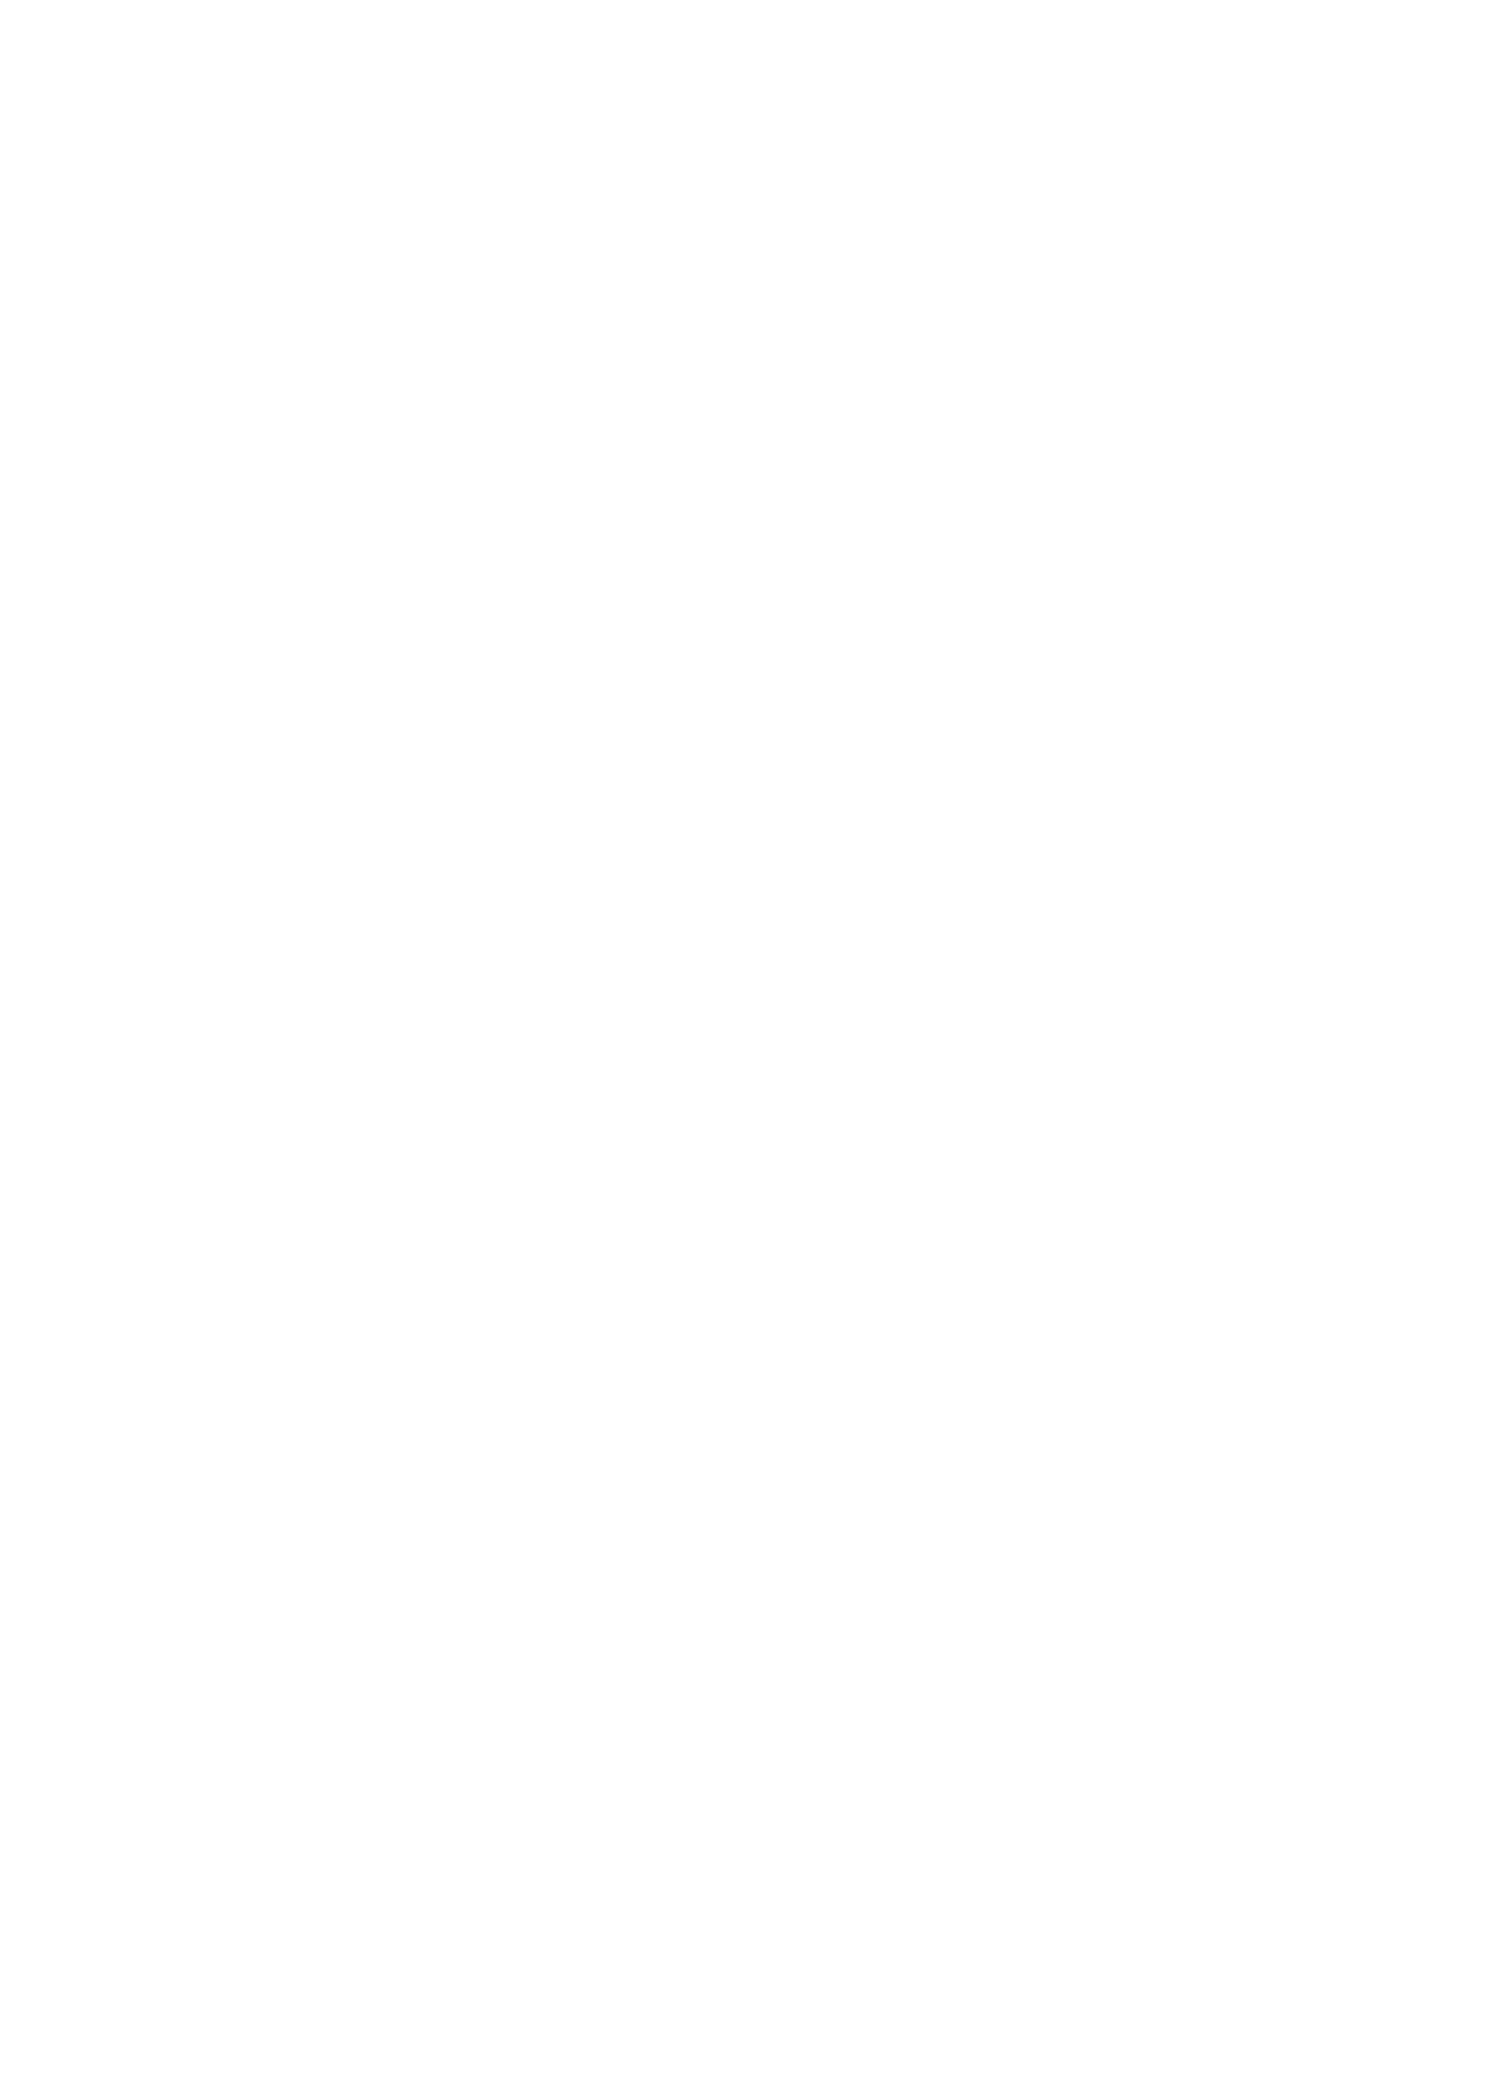 FlowForma - Evolving Value